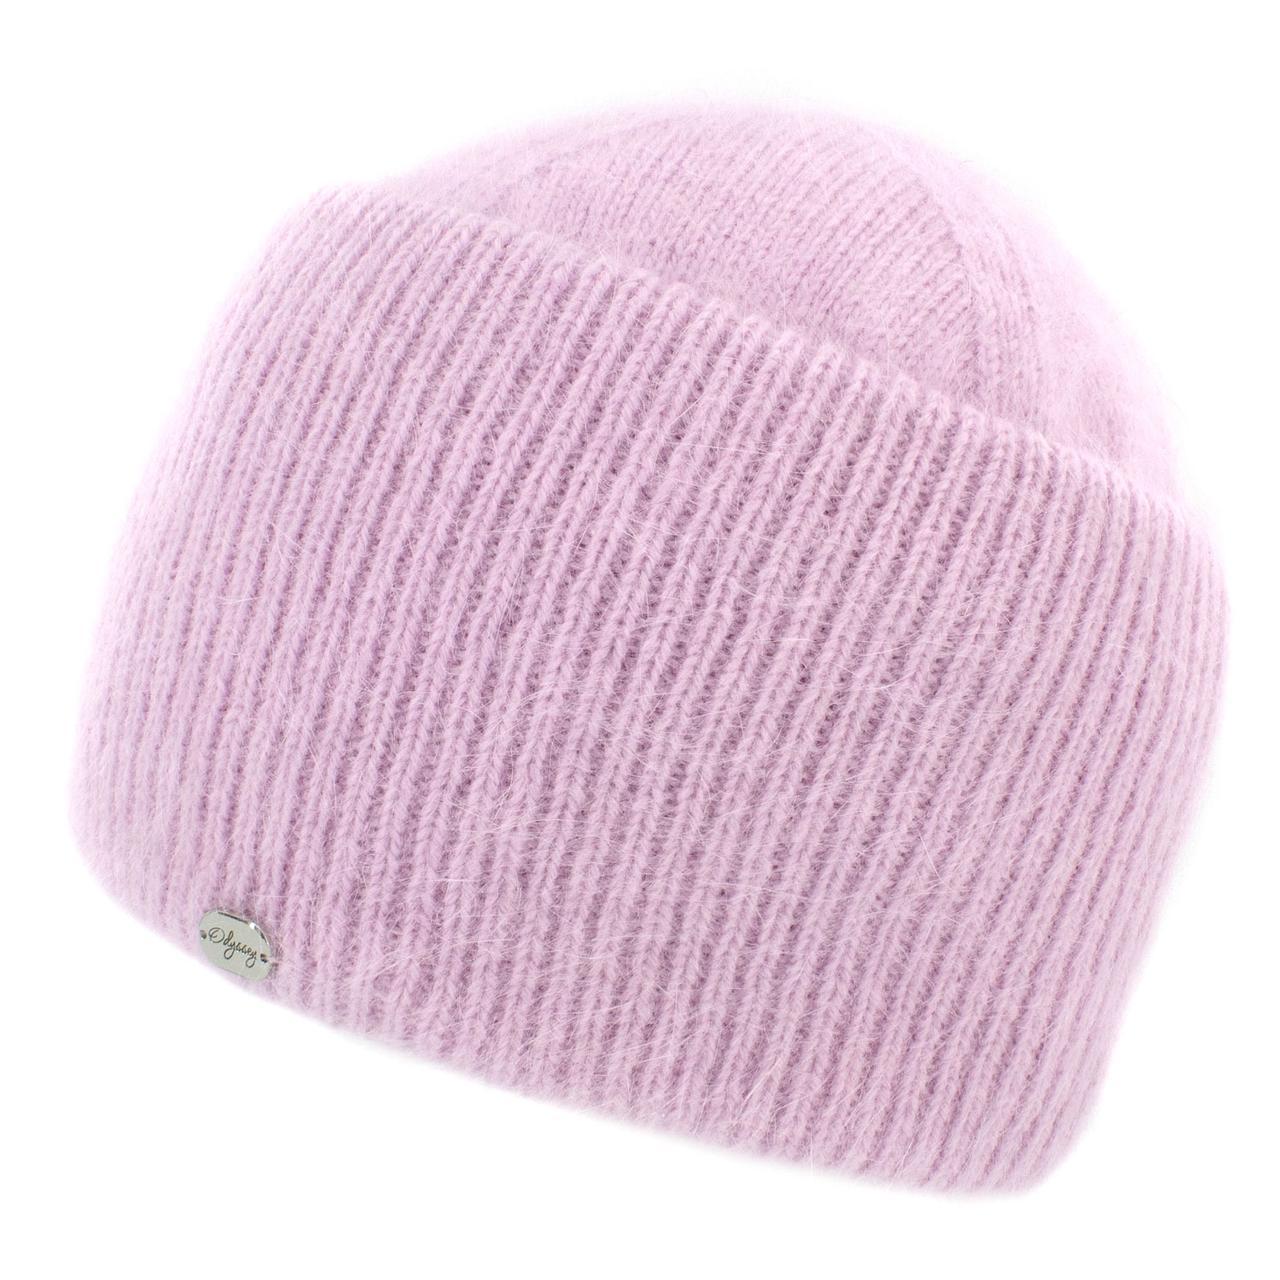 Шапка женская Odysey Мискантус   розовый       ( 43802SD70 m )